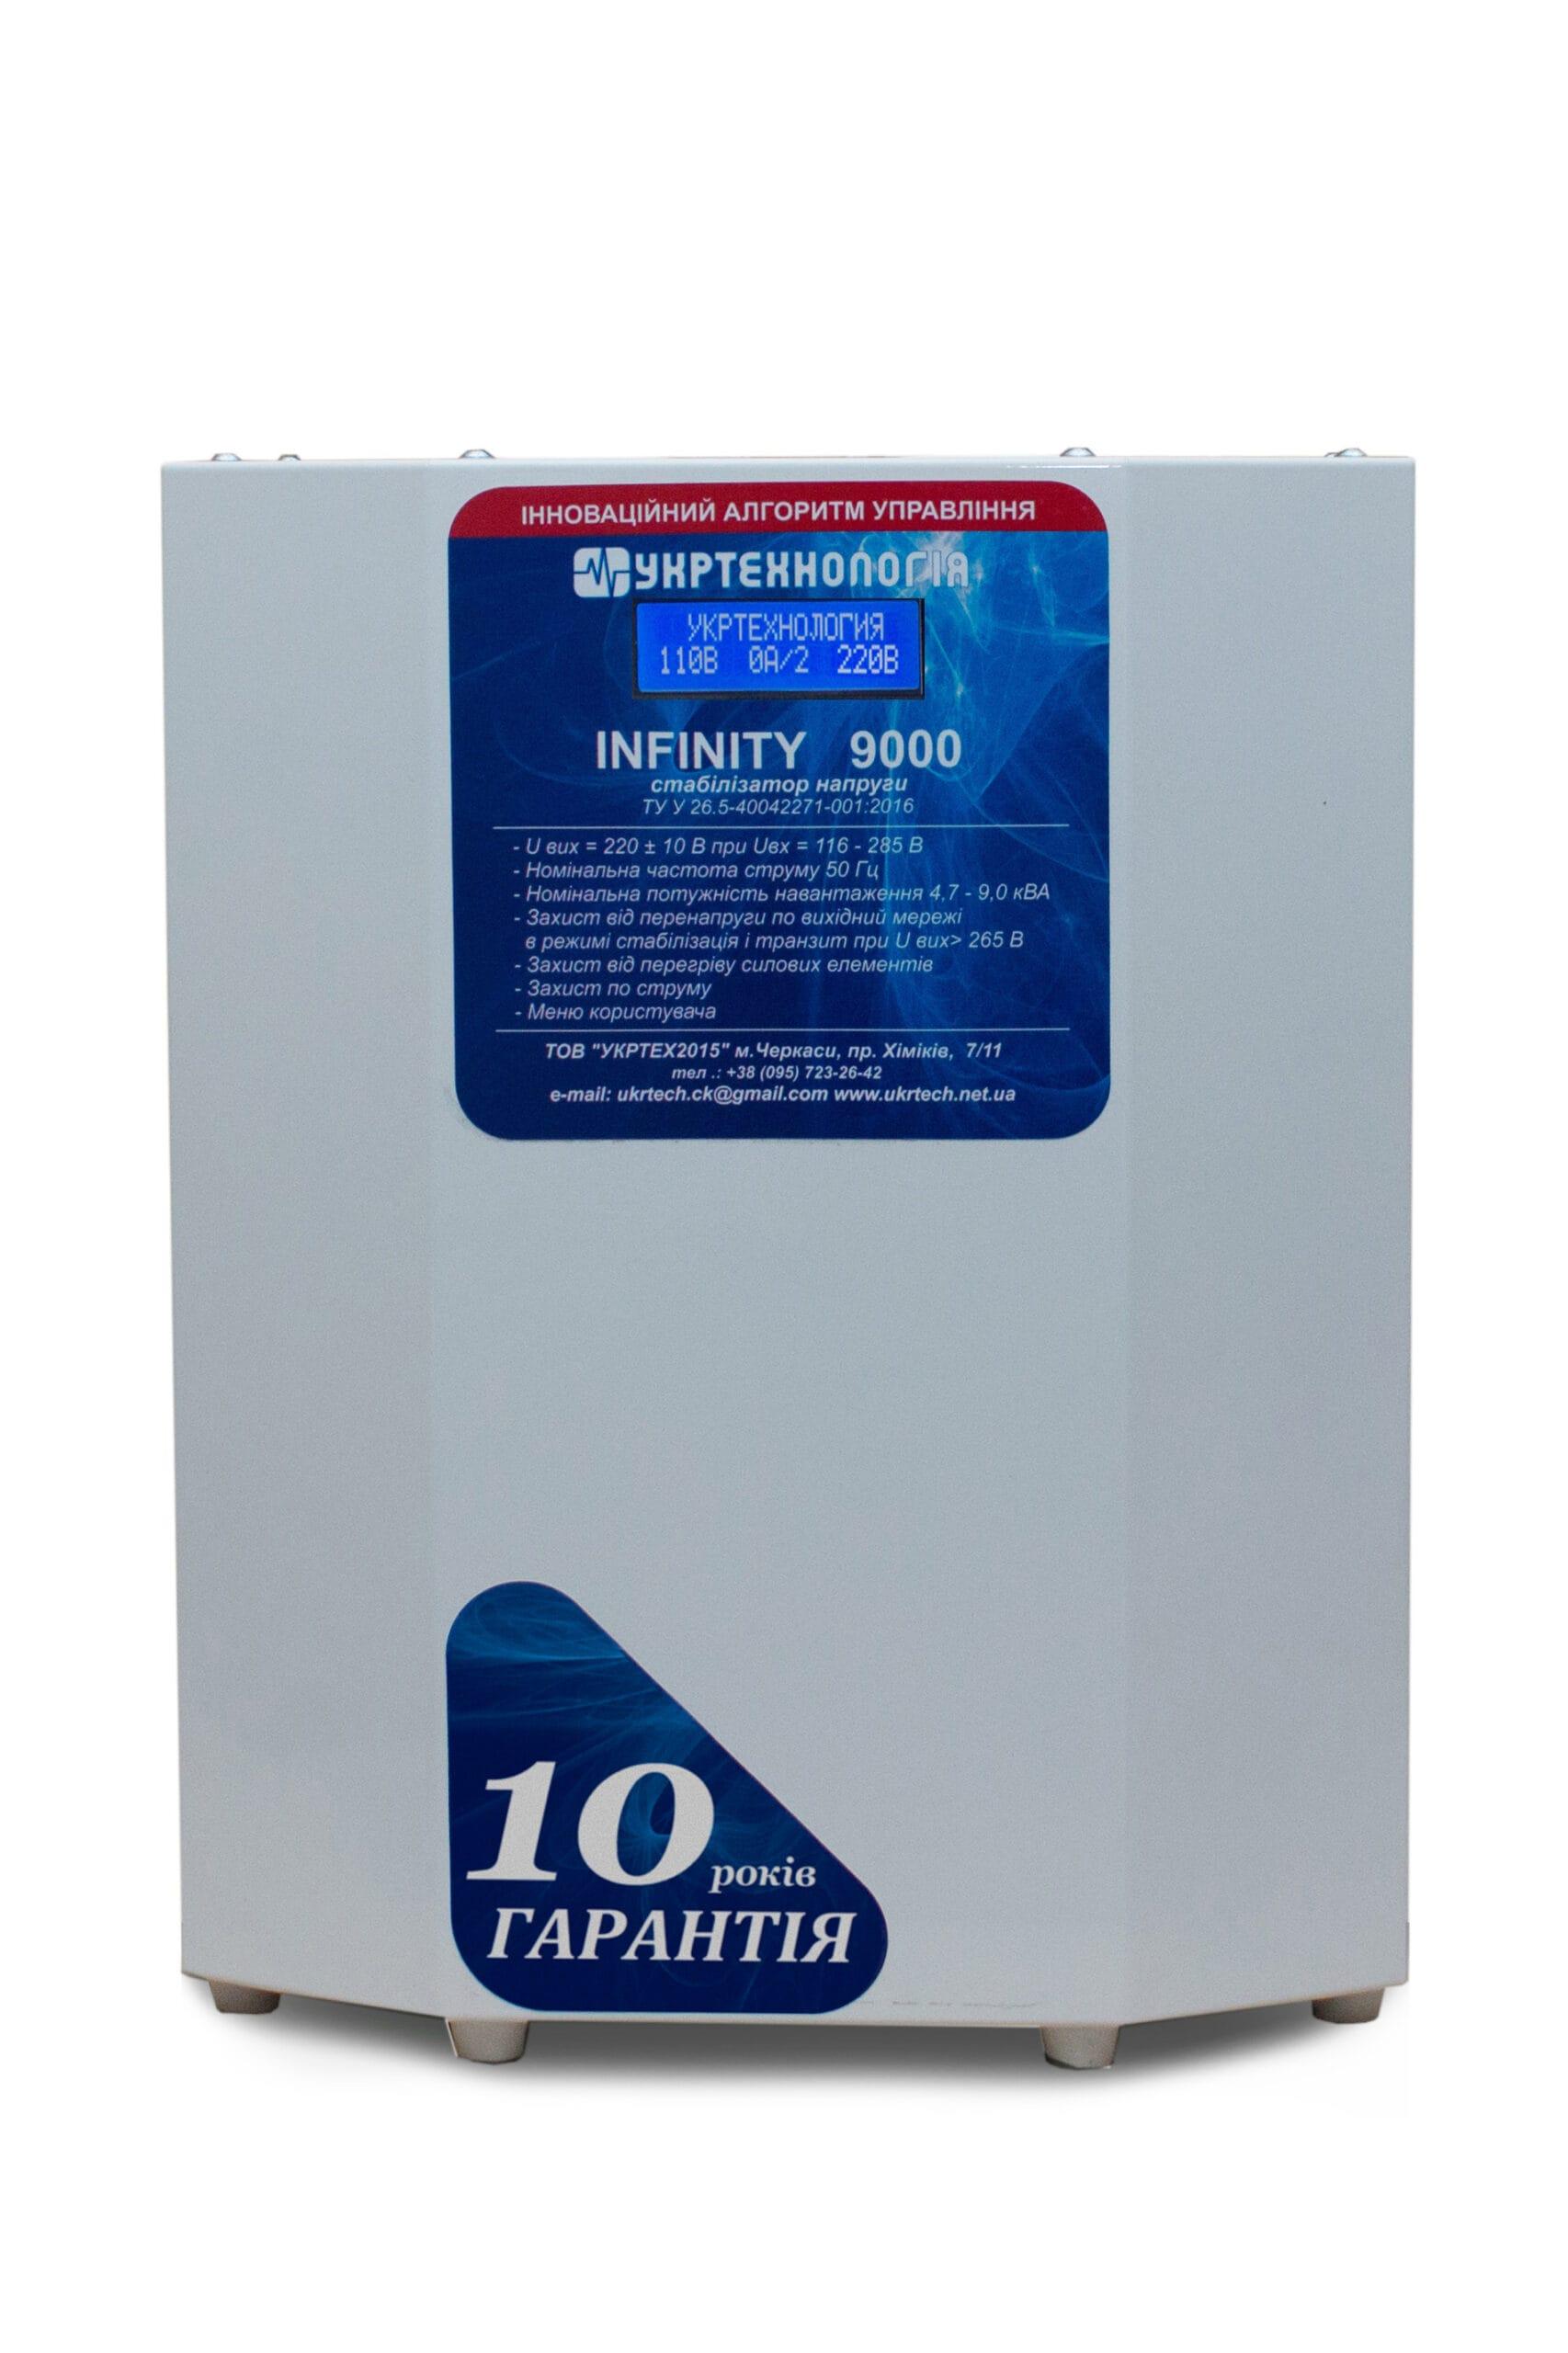 Стабилизаторы напряжения - Стабилизатор напряжения 9 кВт INFINITY 000001412 - Фото 3